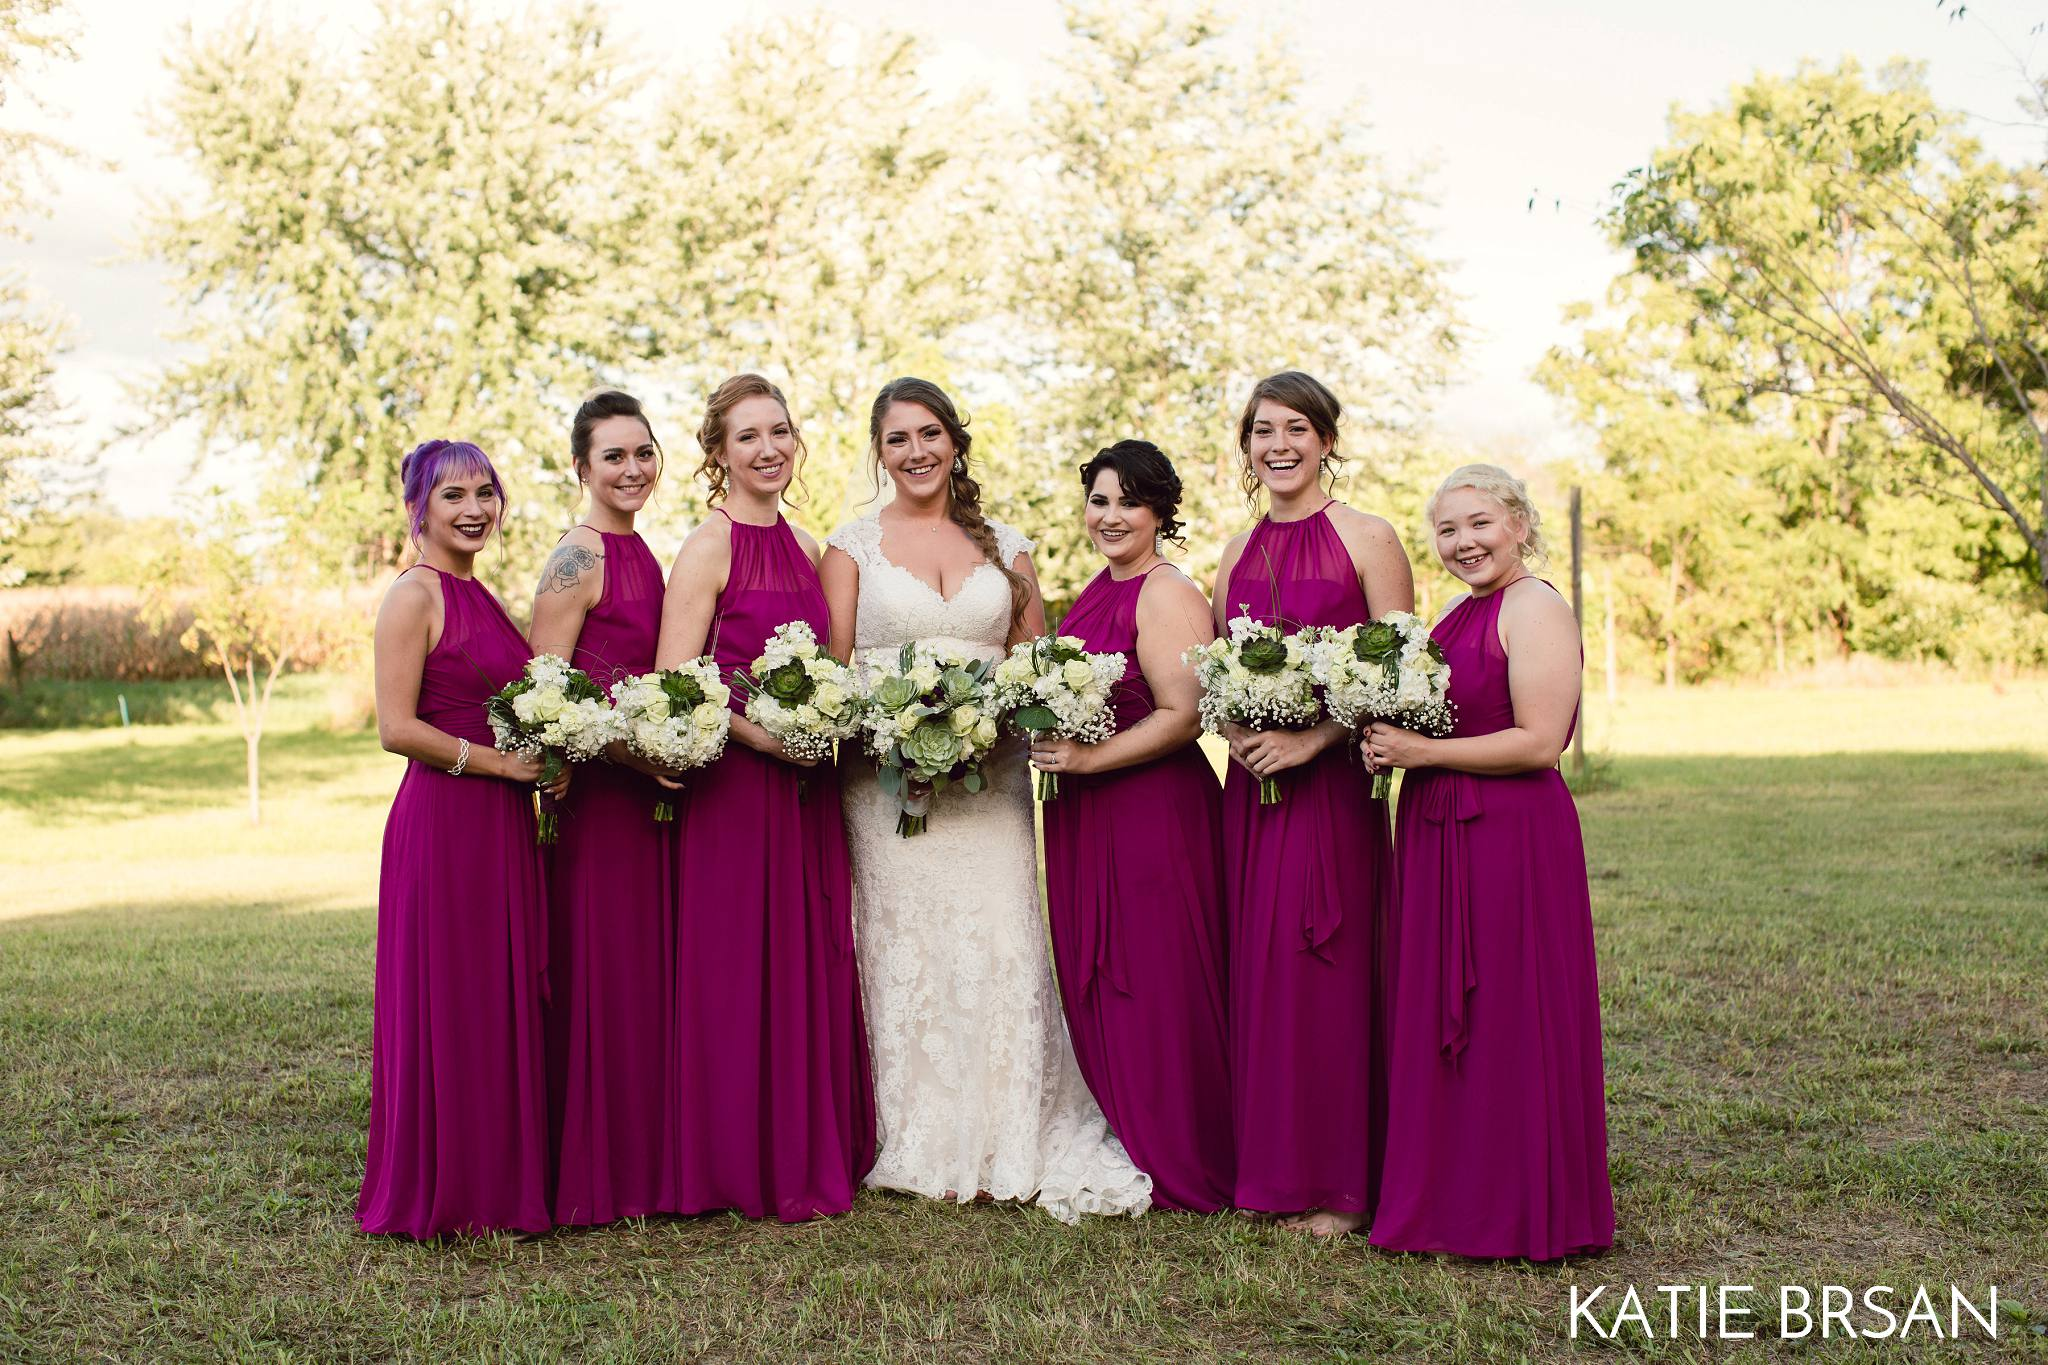 KatieBrsan-Bonfield-Backyard-Wedding_0410.jpg